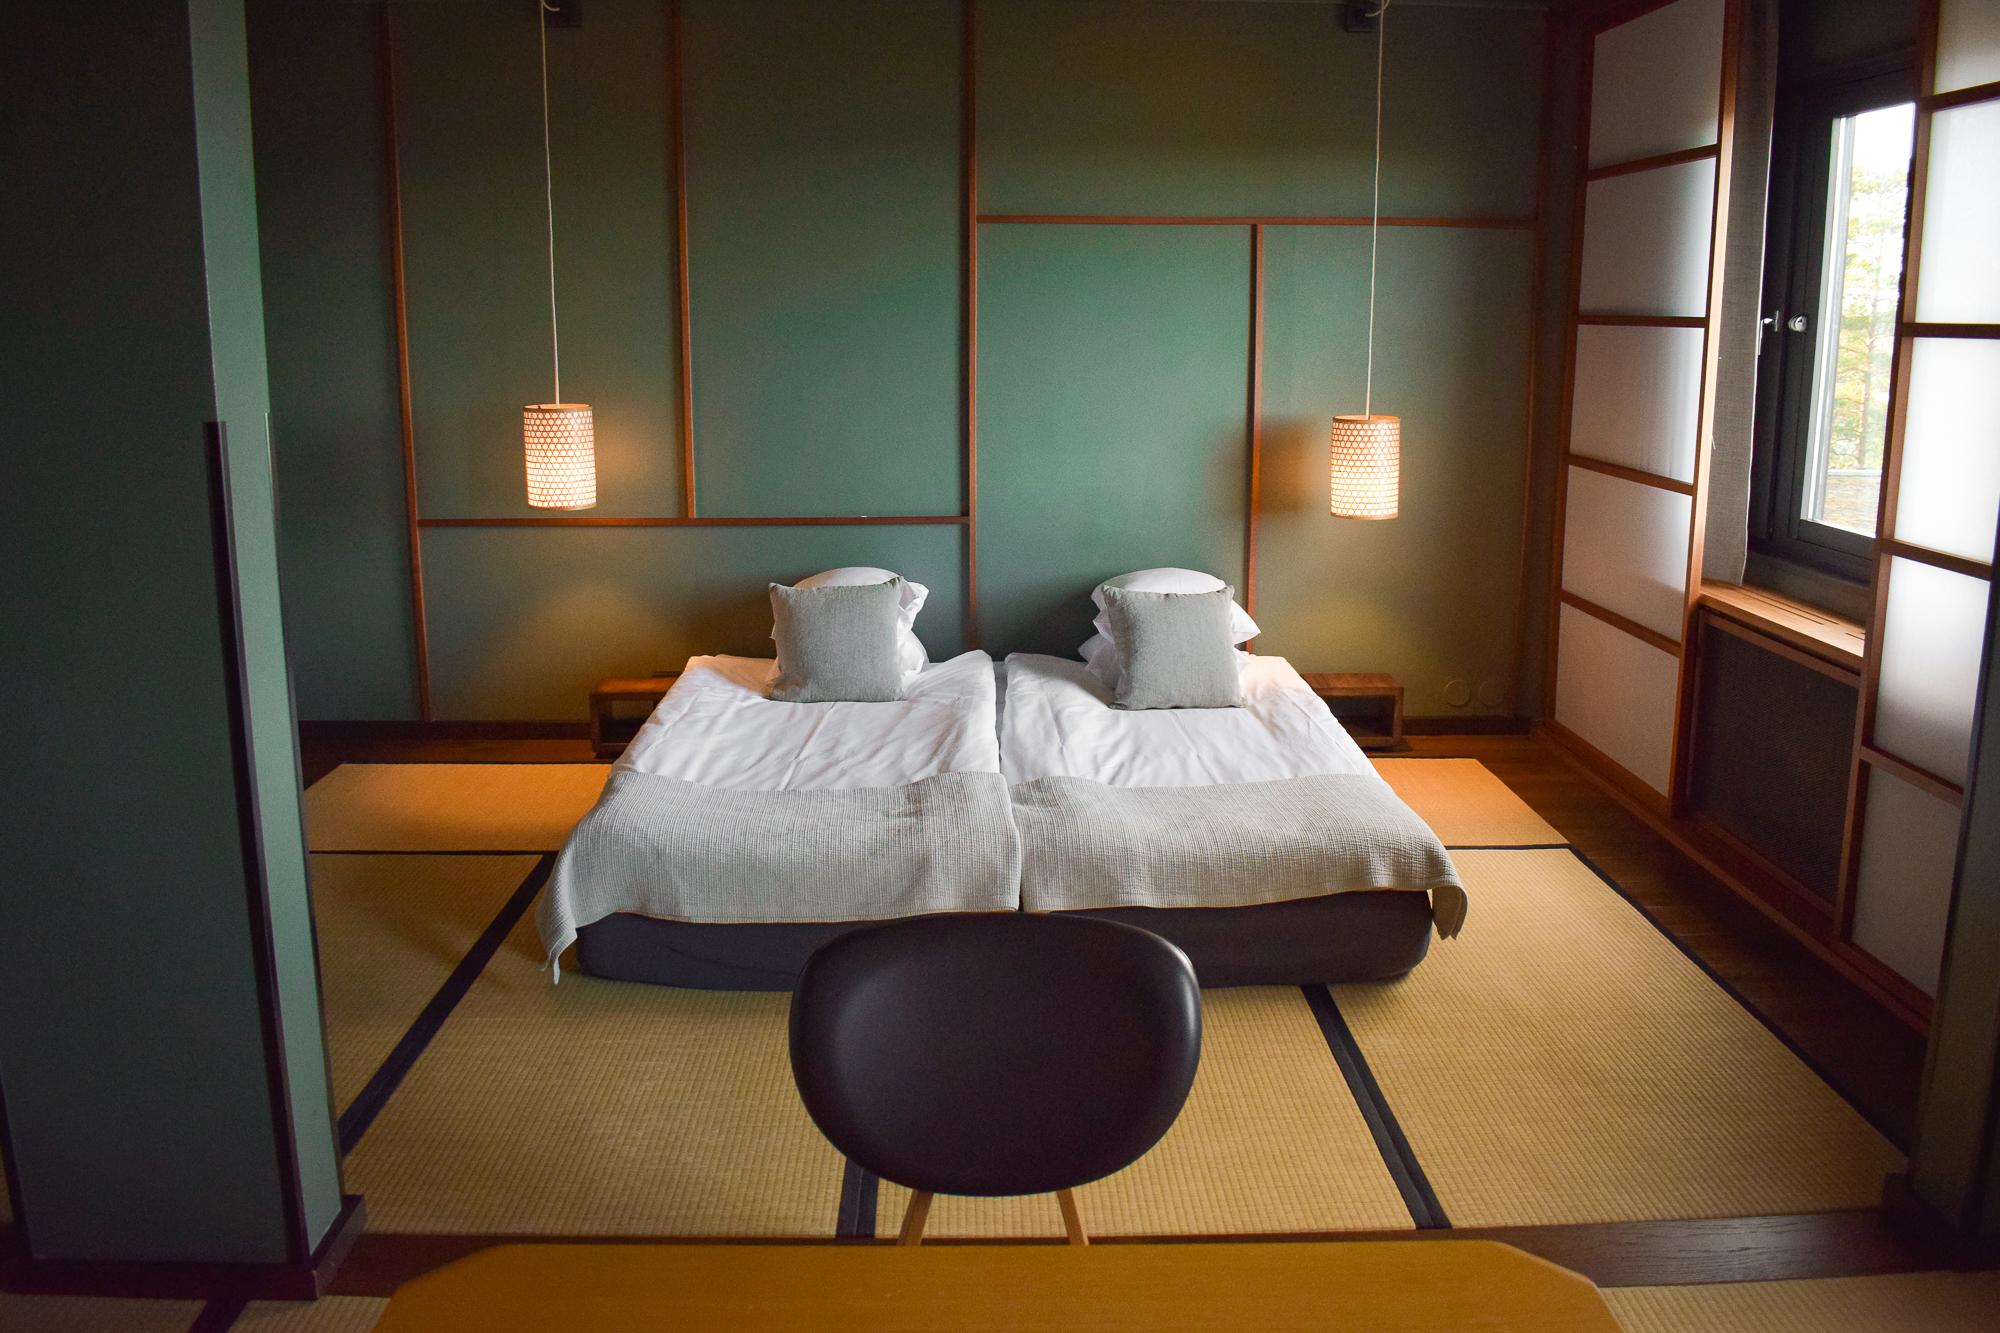 hotellrum på Yasuragi i stockholm.